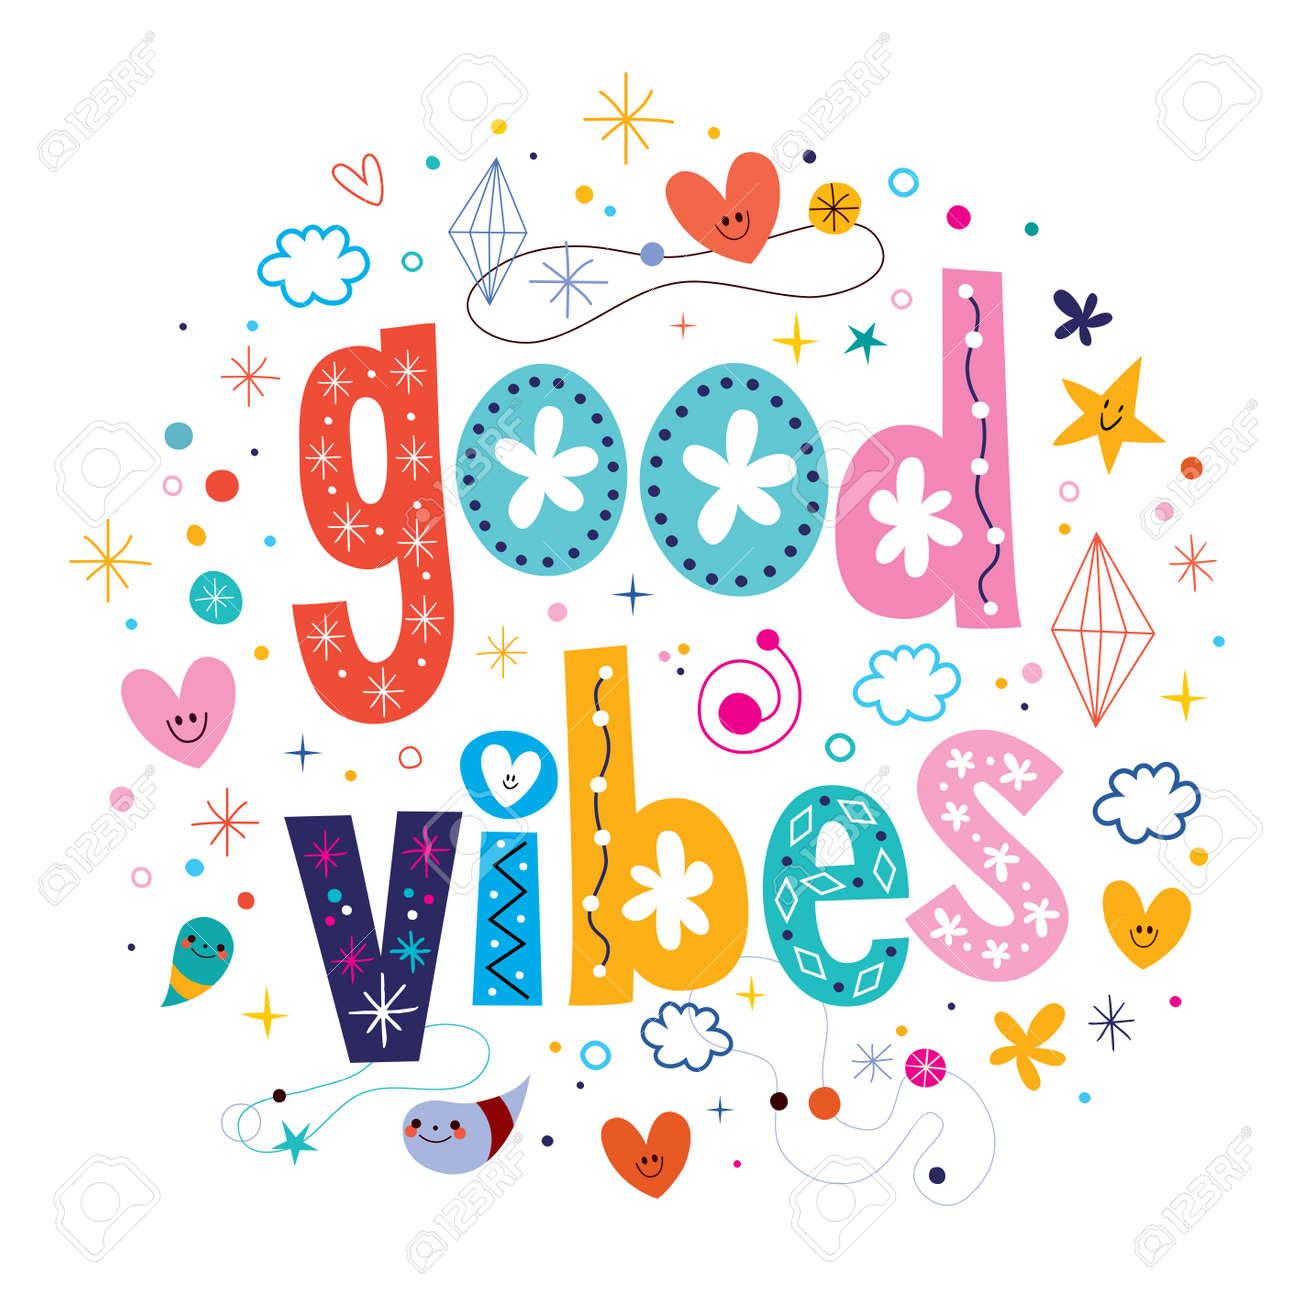 good vibes - 53748721